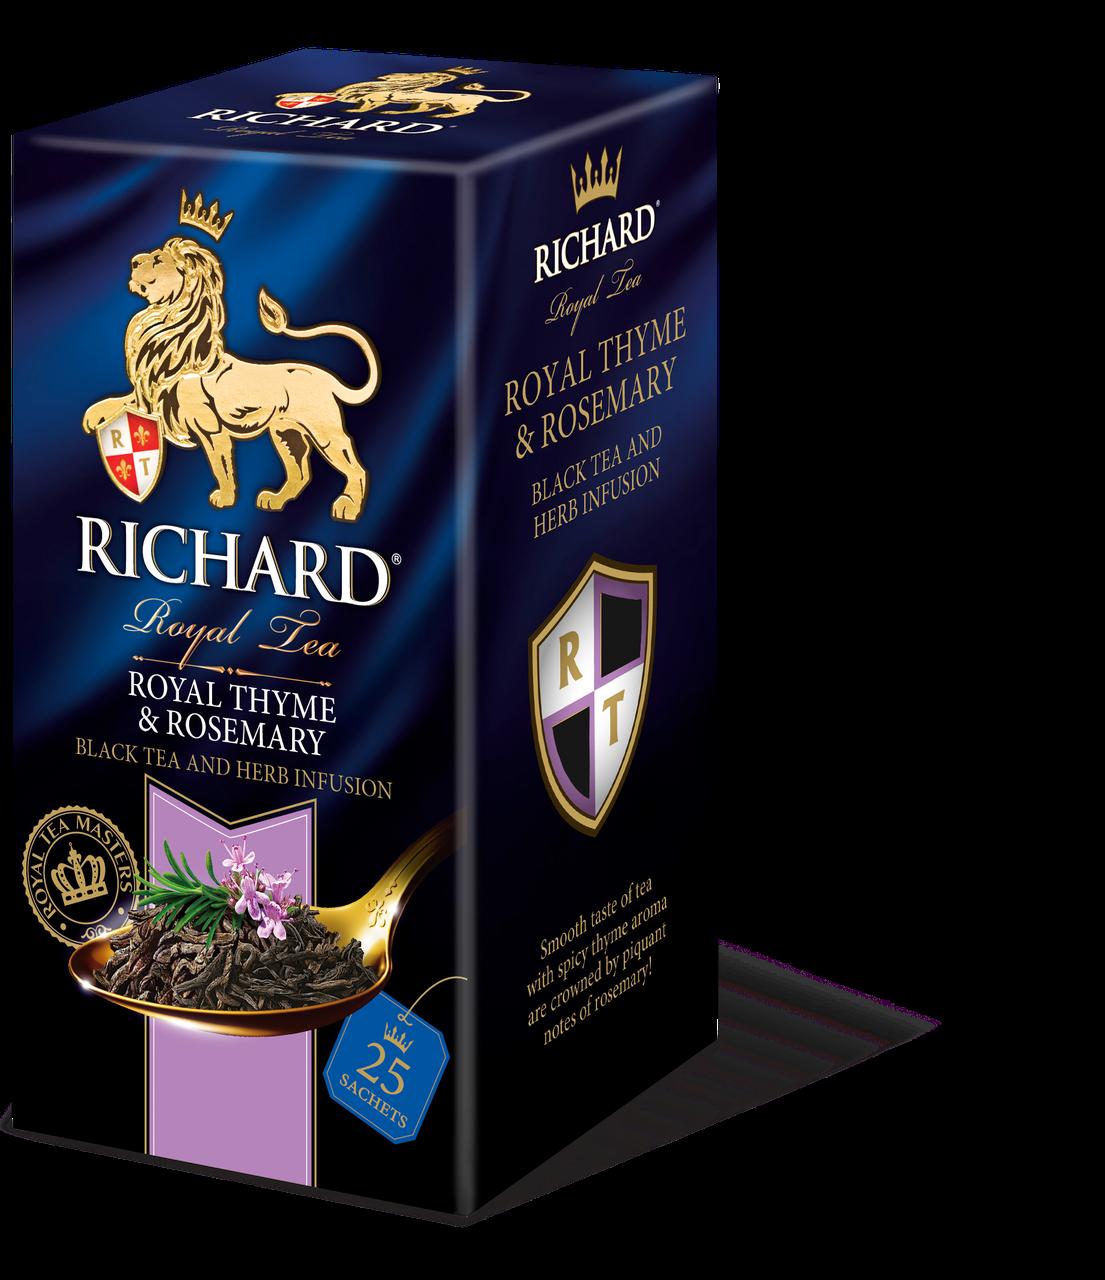 Чай черный в сашетах со вкусом чабреца и розмарина Richard Royal Thyme&Rosemary (Ричард), 25 сашетов